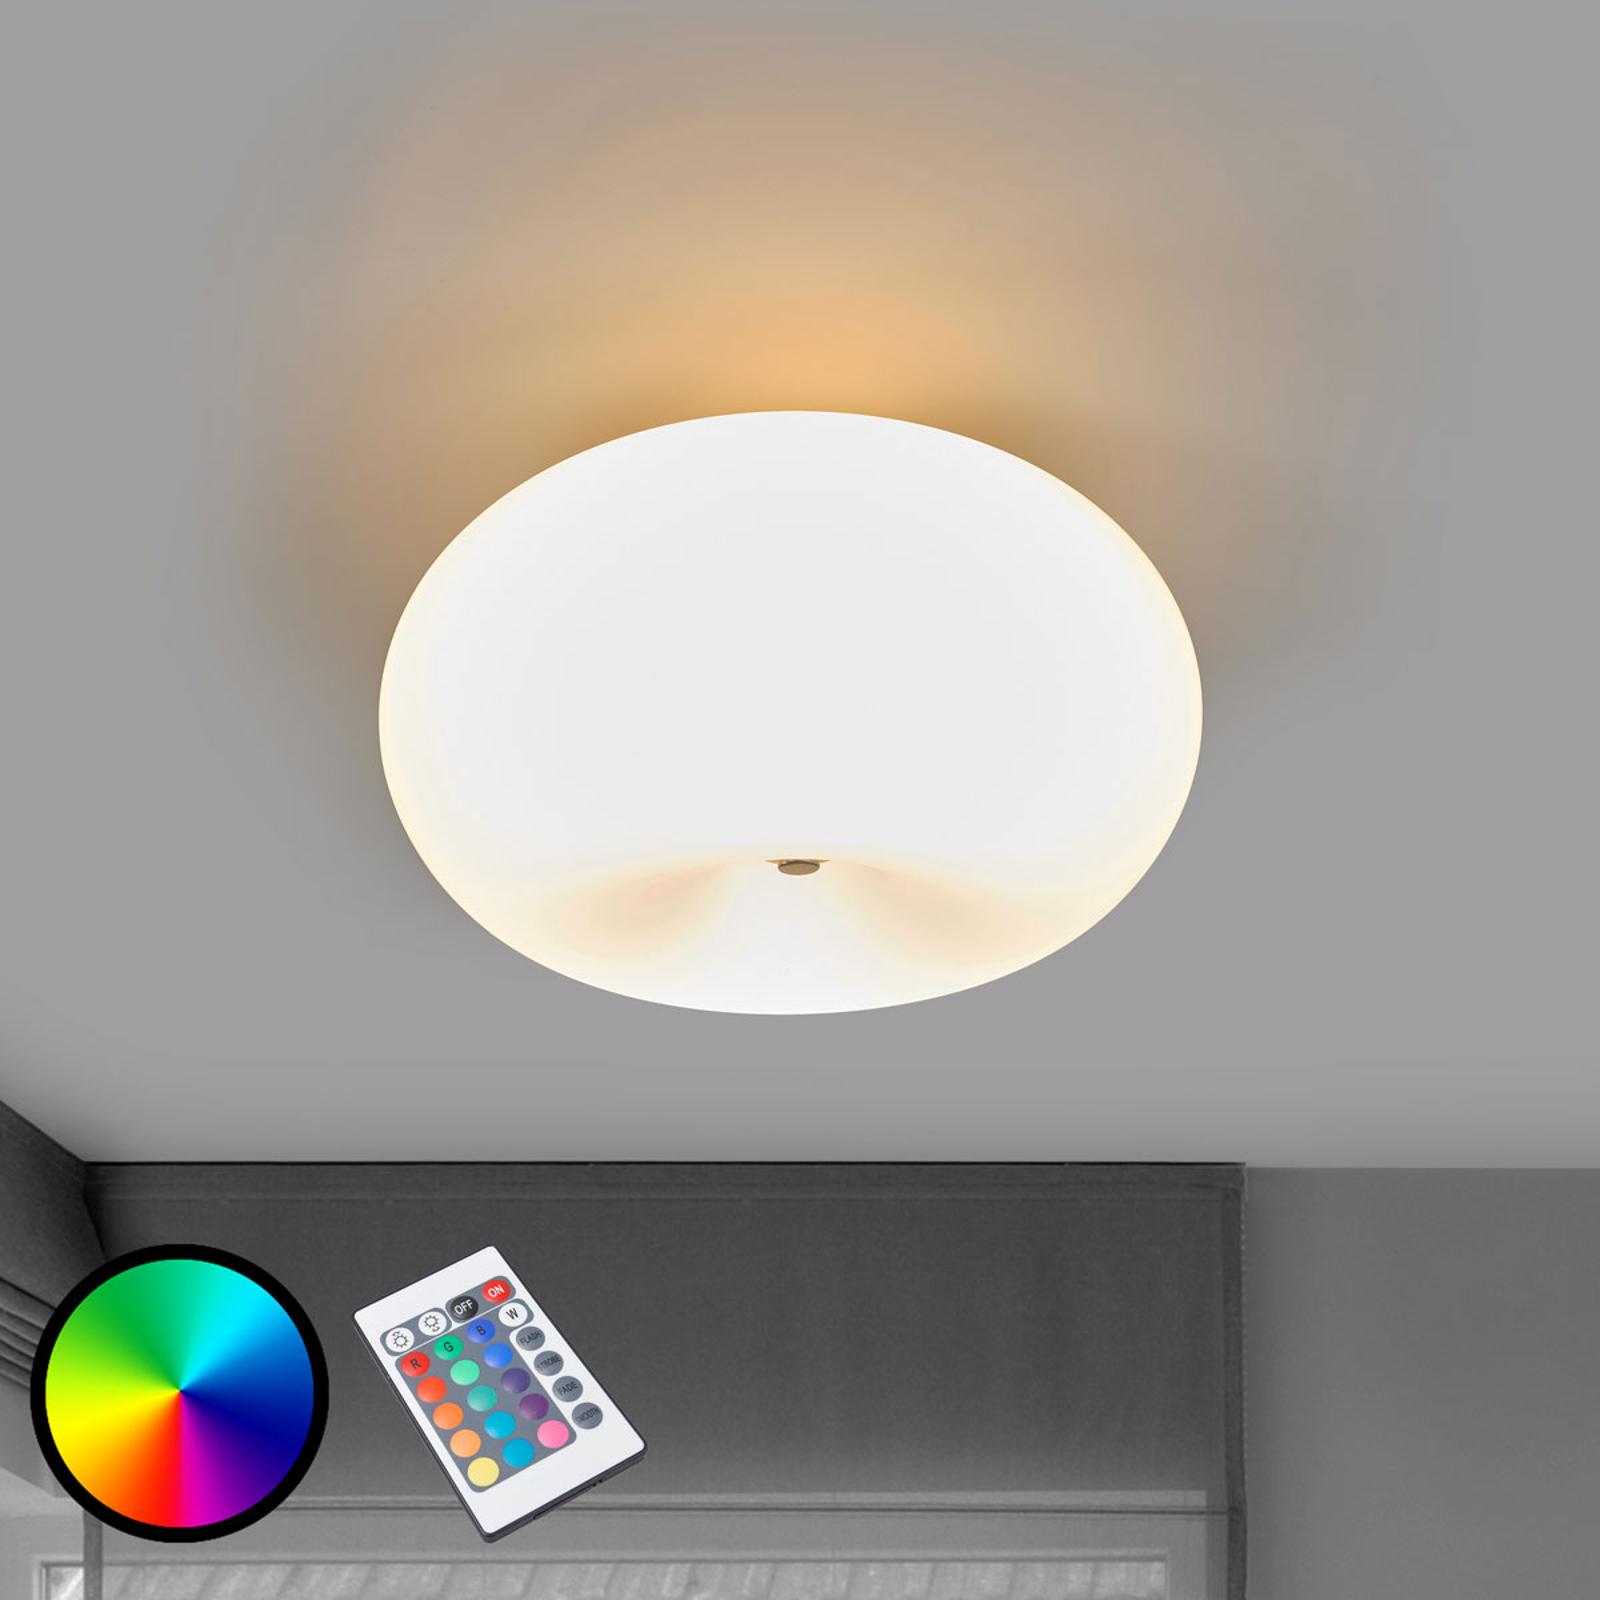 LED-plafondlamp Optica-C RGBW met afstandsbed.